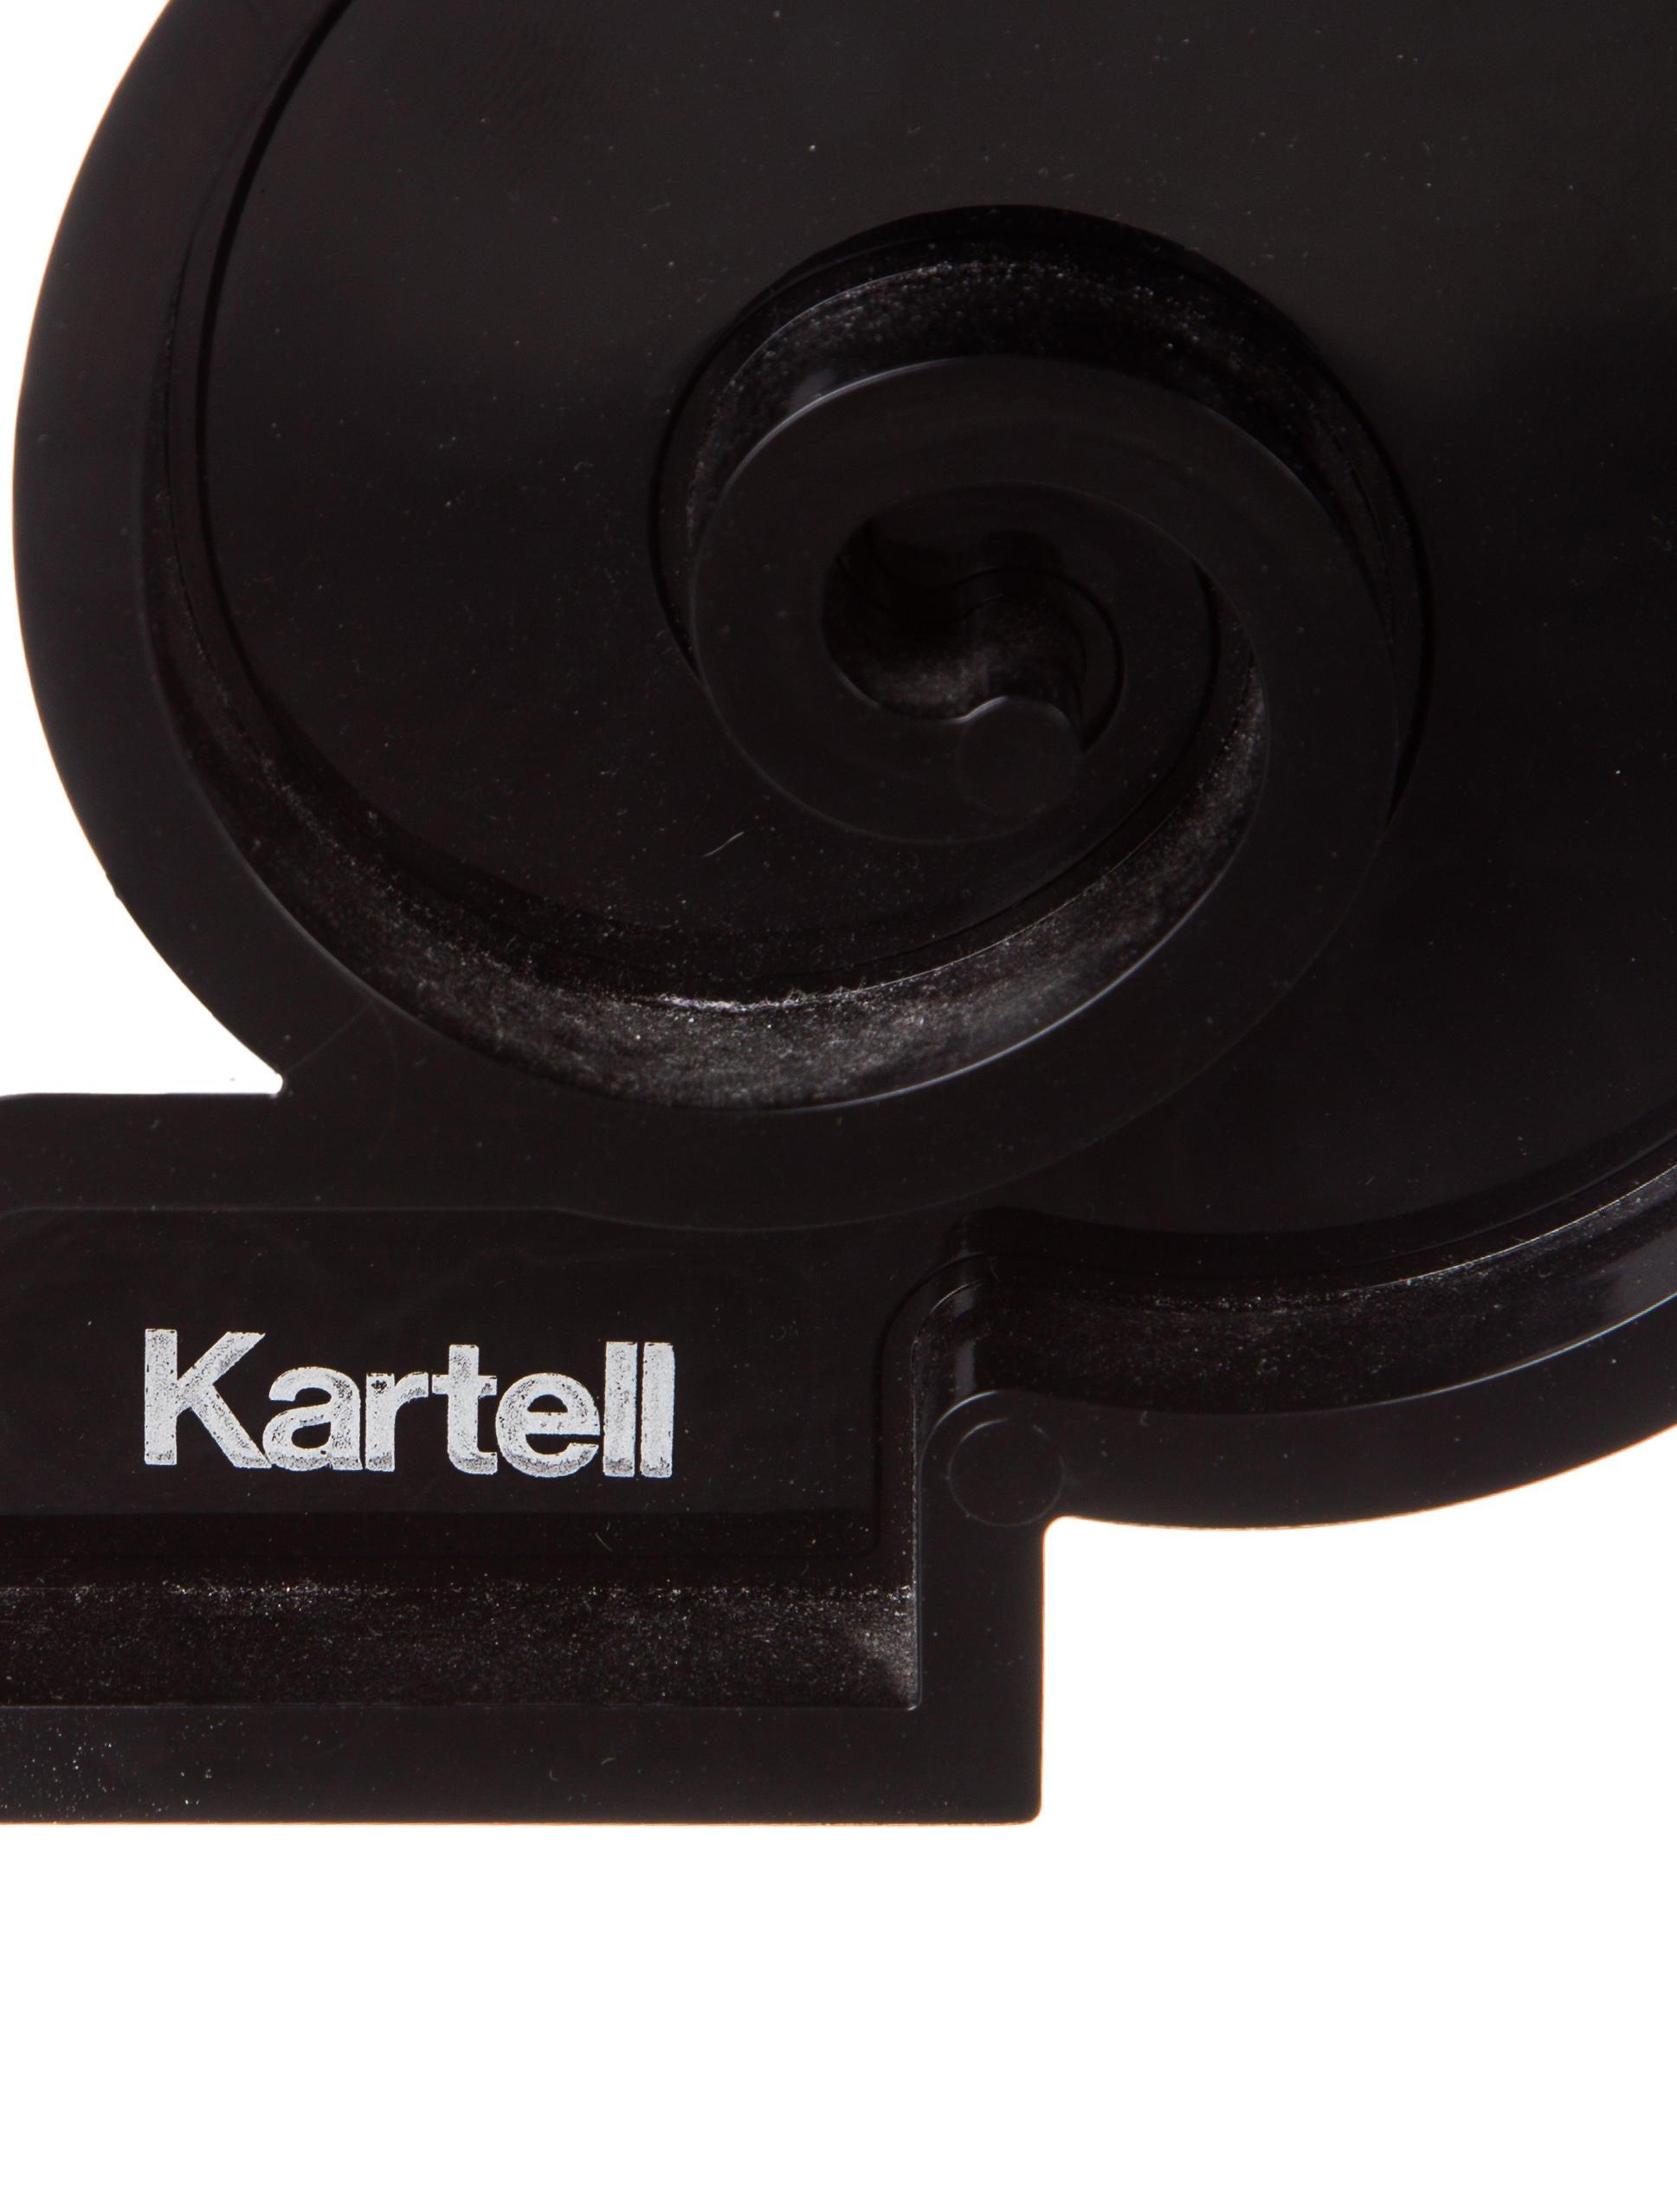 Kartell Bourgie Table Lamp Lighting Ktl20127 The